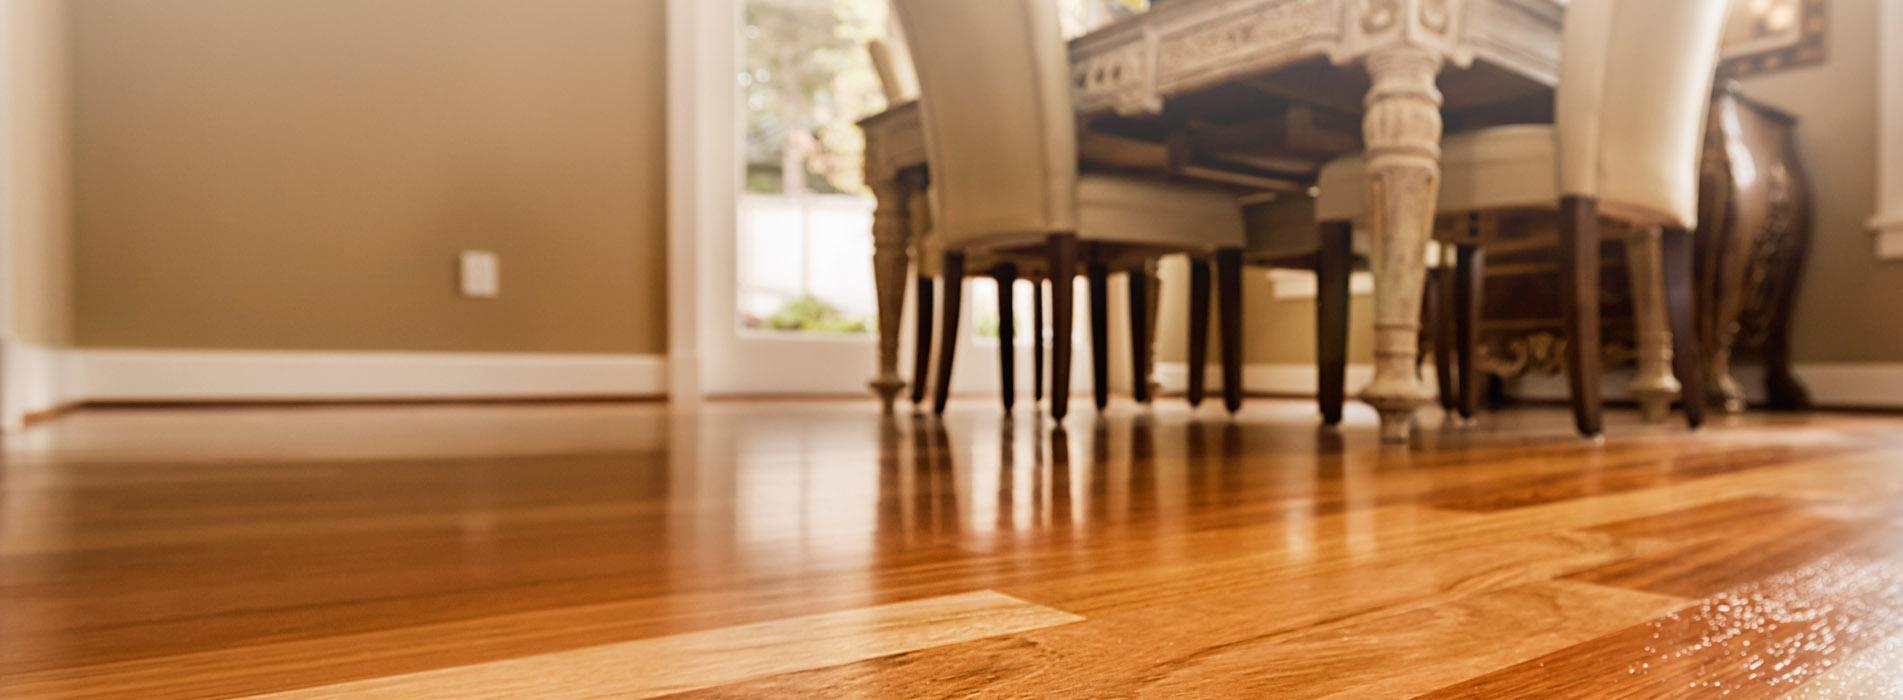 Seattle Hardwood Floor Cleaning & Preservation